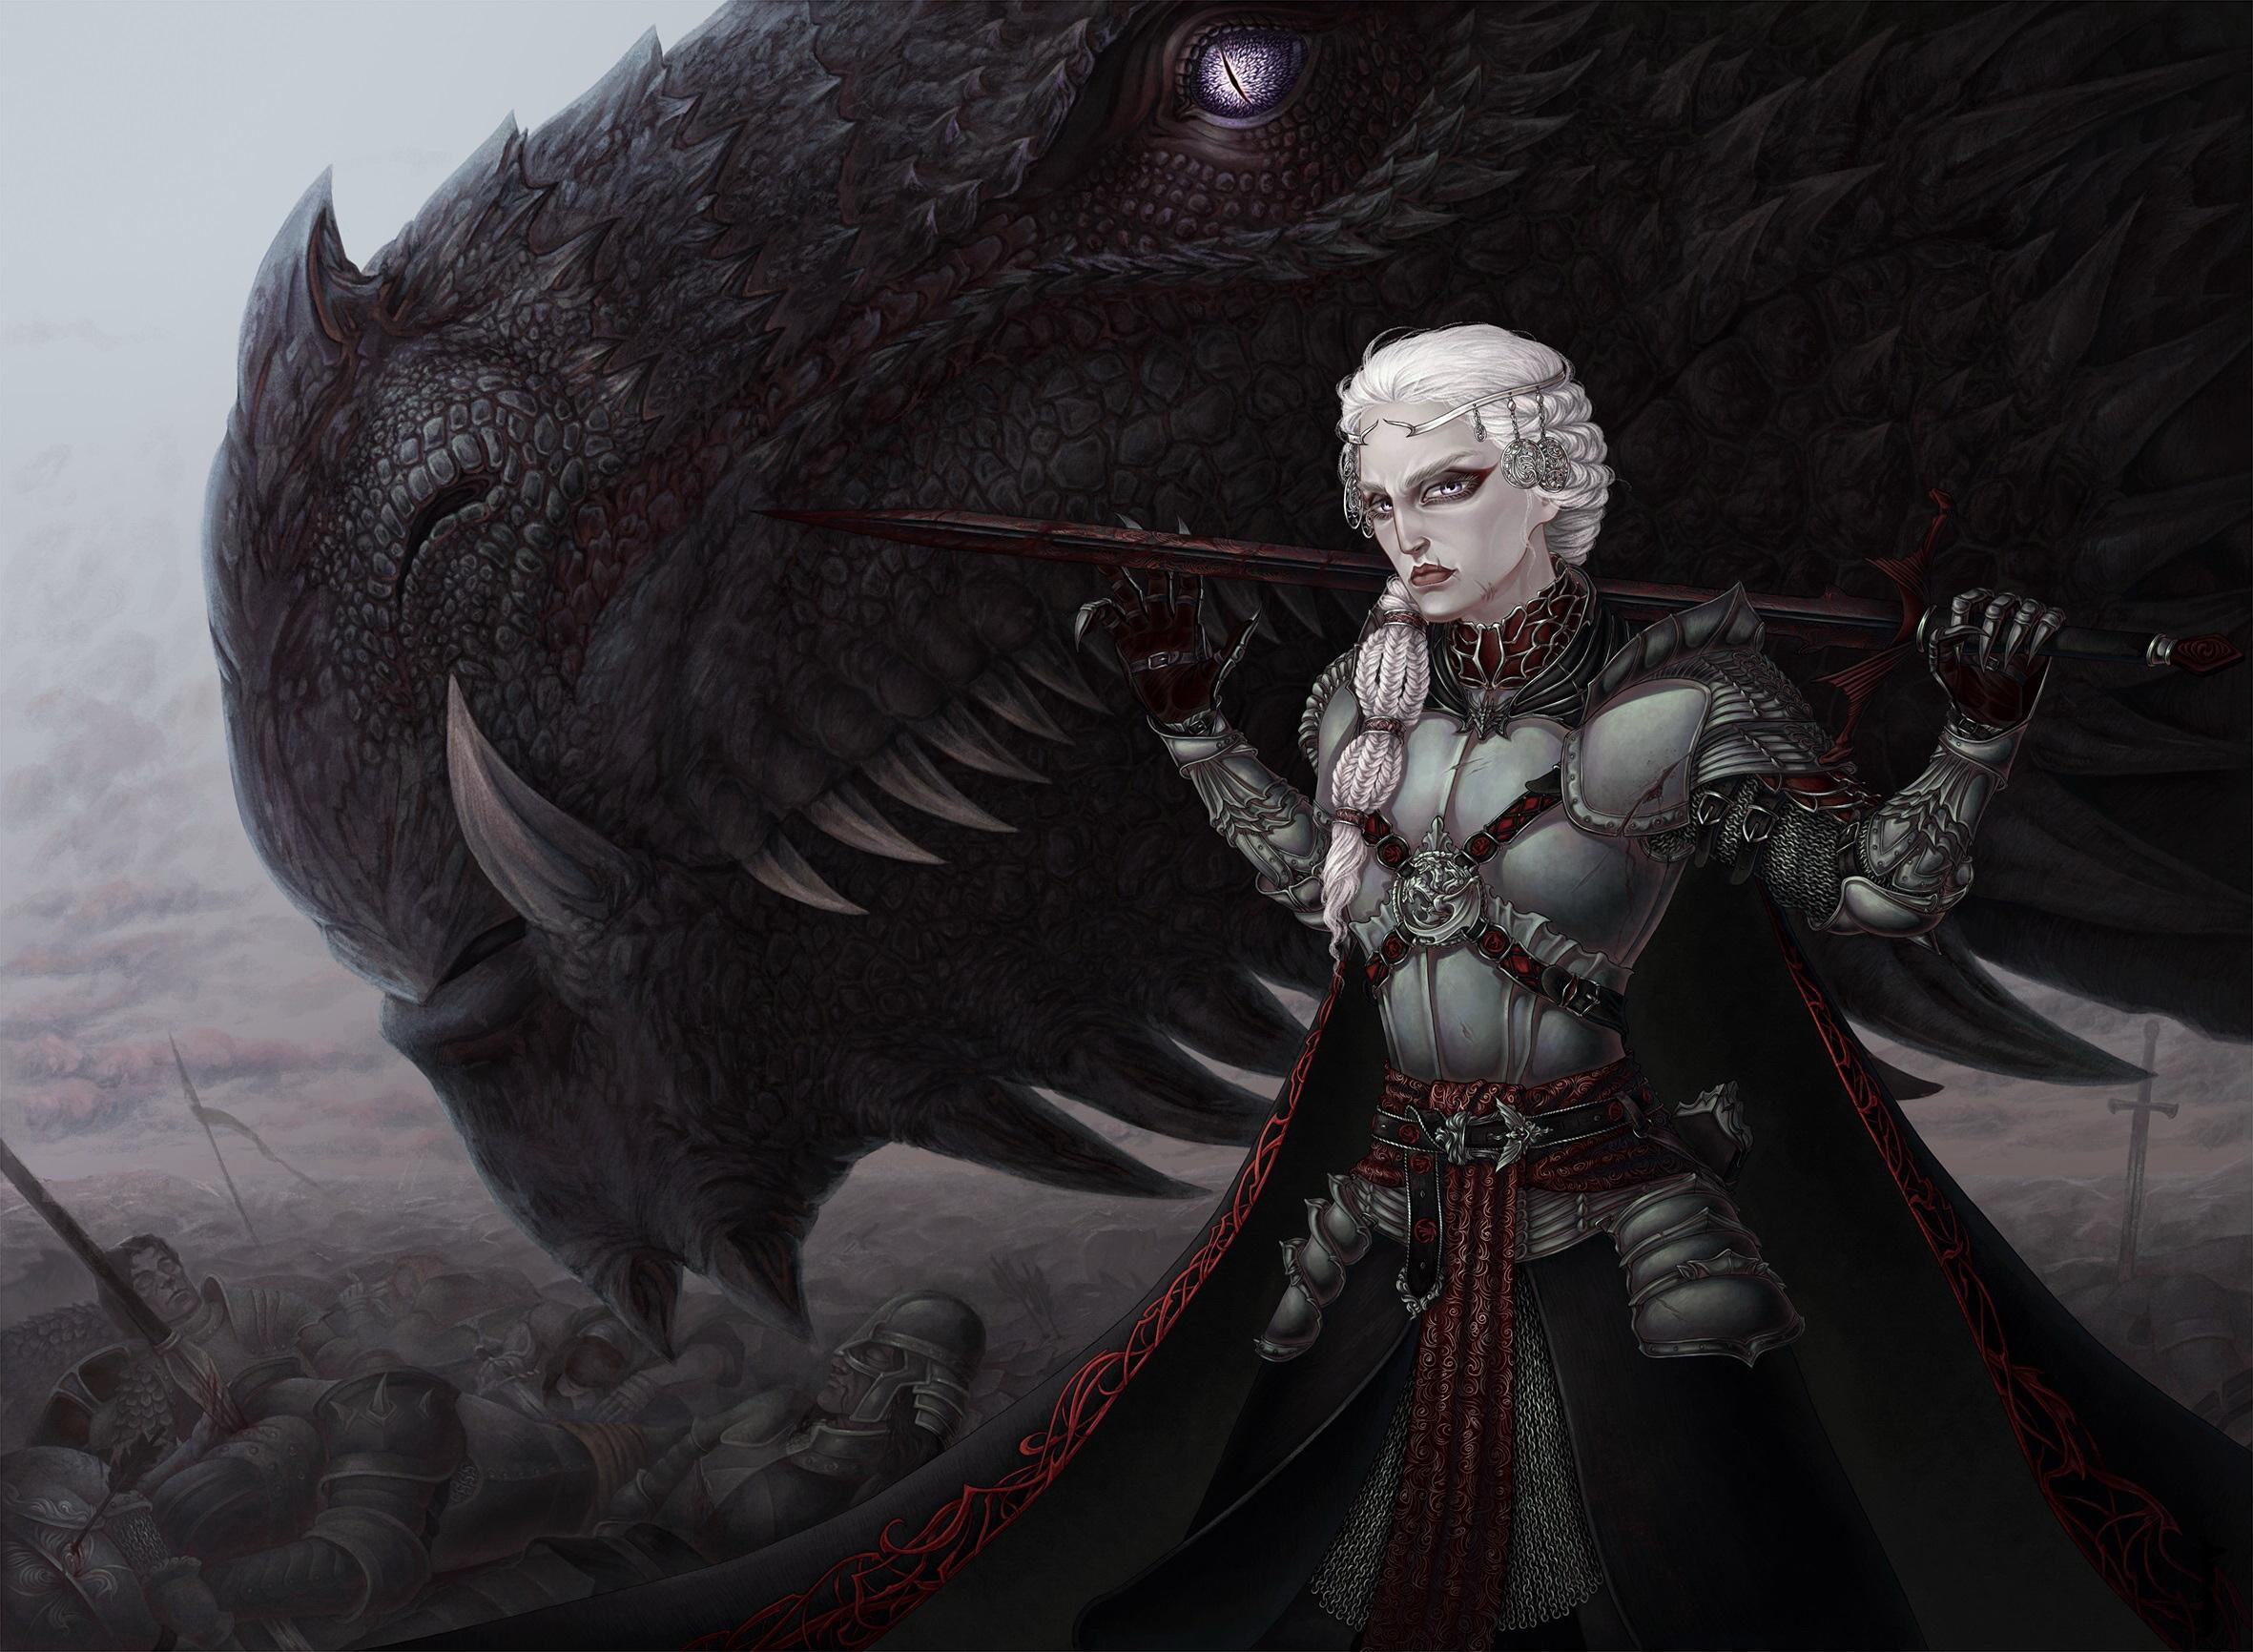 Wallpaper Game Of Thrones Armor Dragons Warriors Fan Art 2362x1732